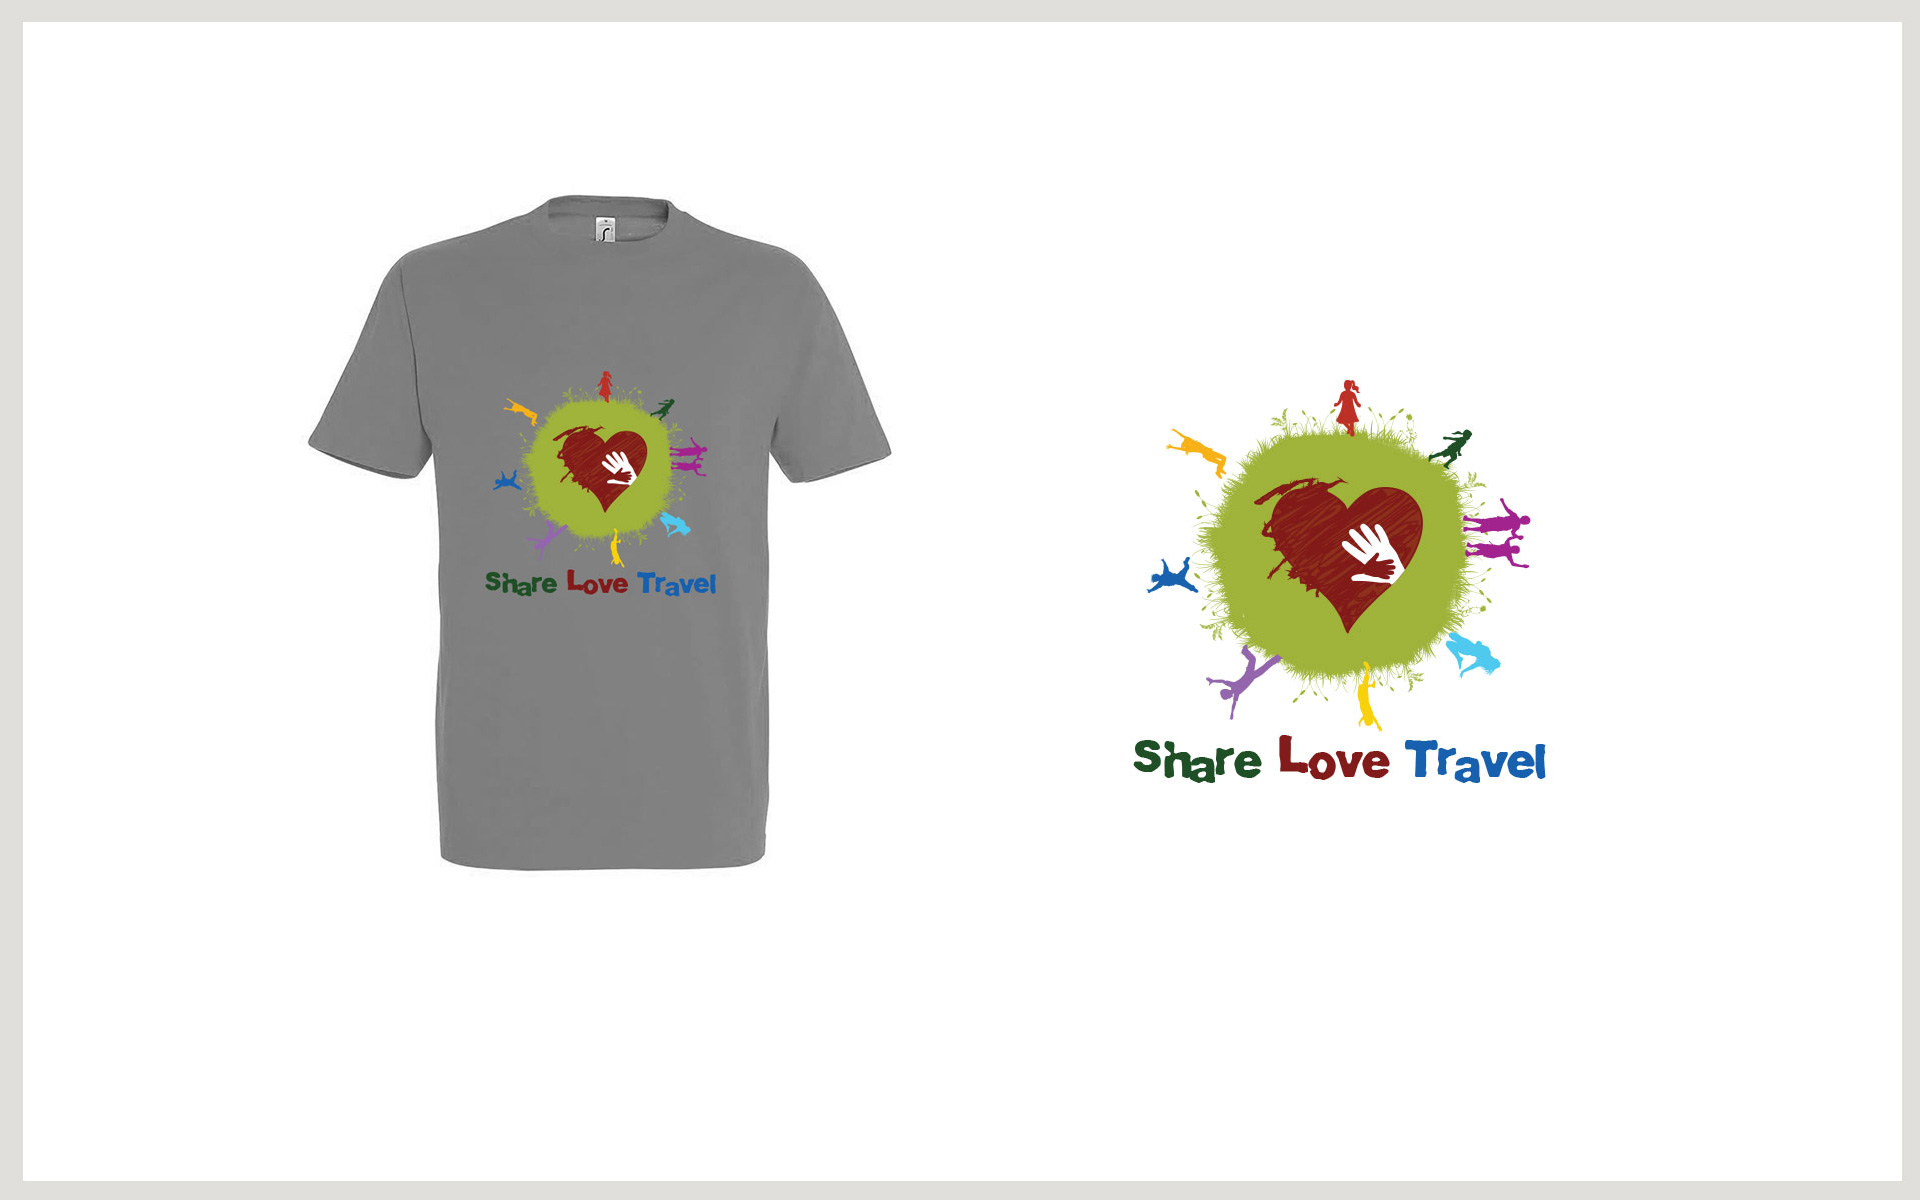 SHARE LOVE TRAVEL